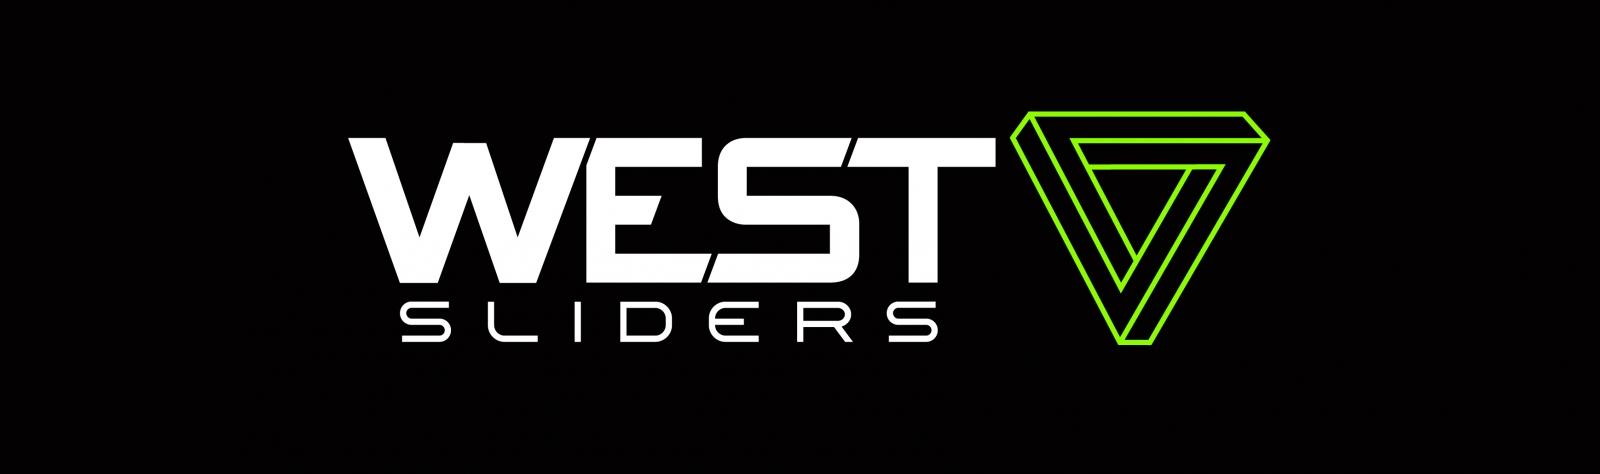 West Sliders